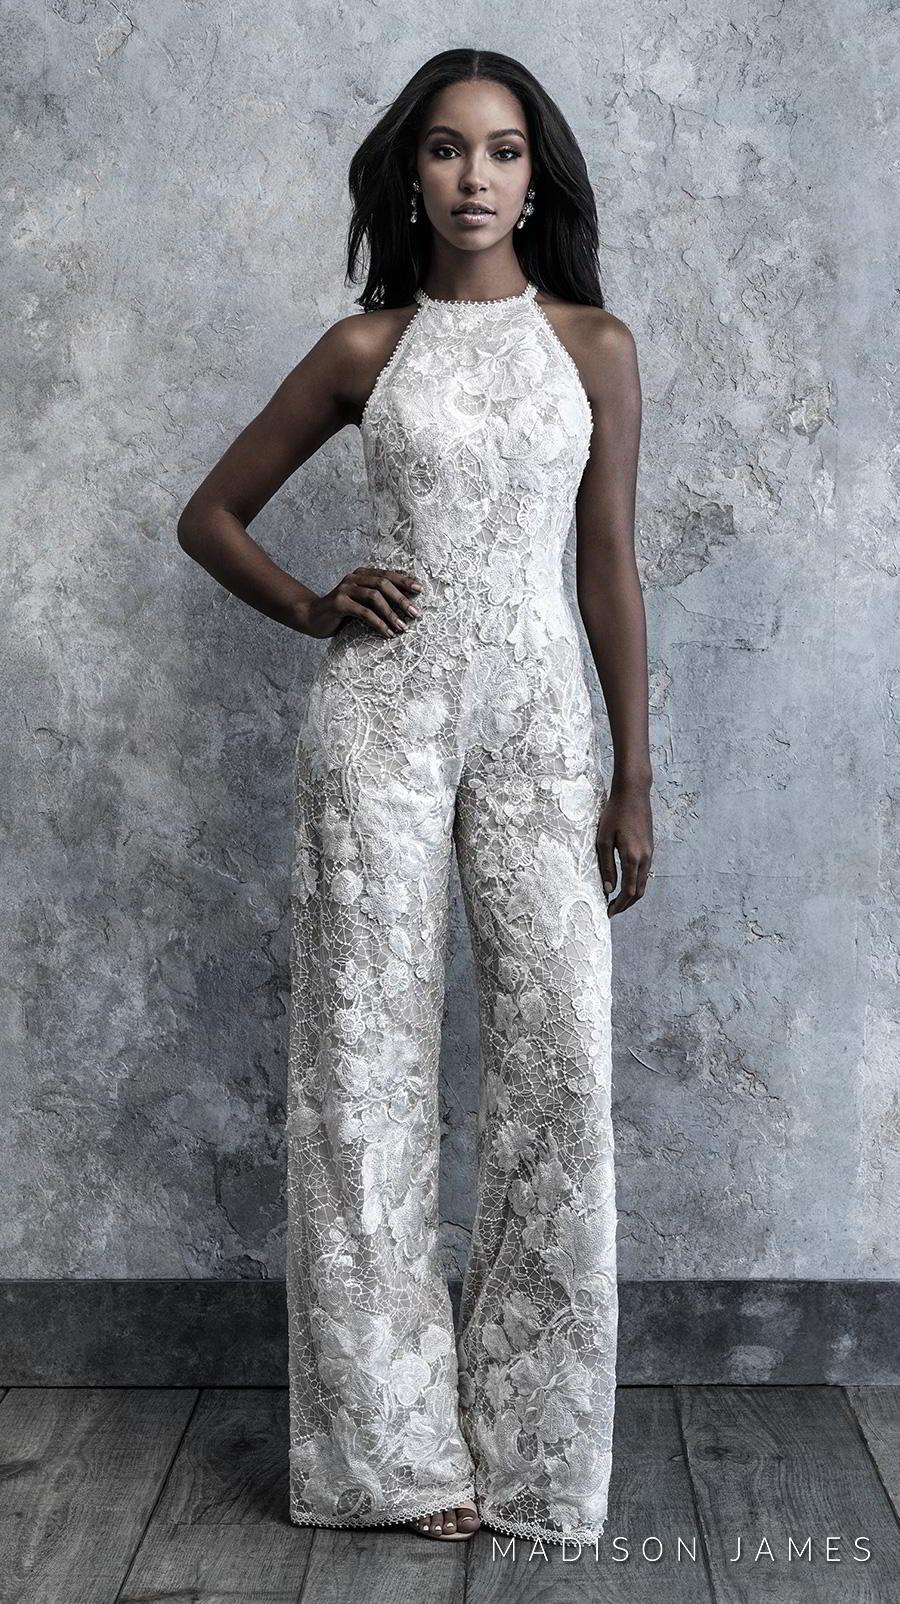 madison james 2019 bridal sleeveless halter neck full embellishment modern sophiscated jumpsuit wedding dress low keyhole back (500) mv